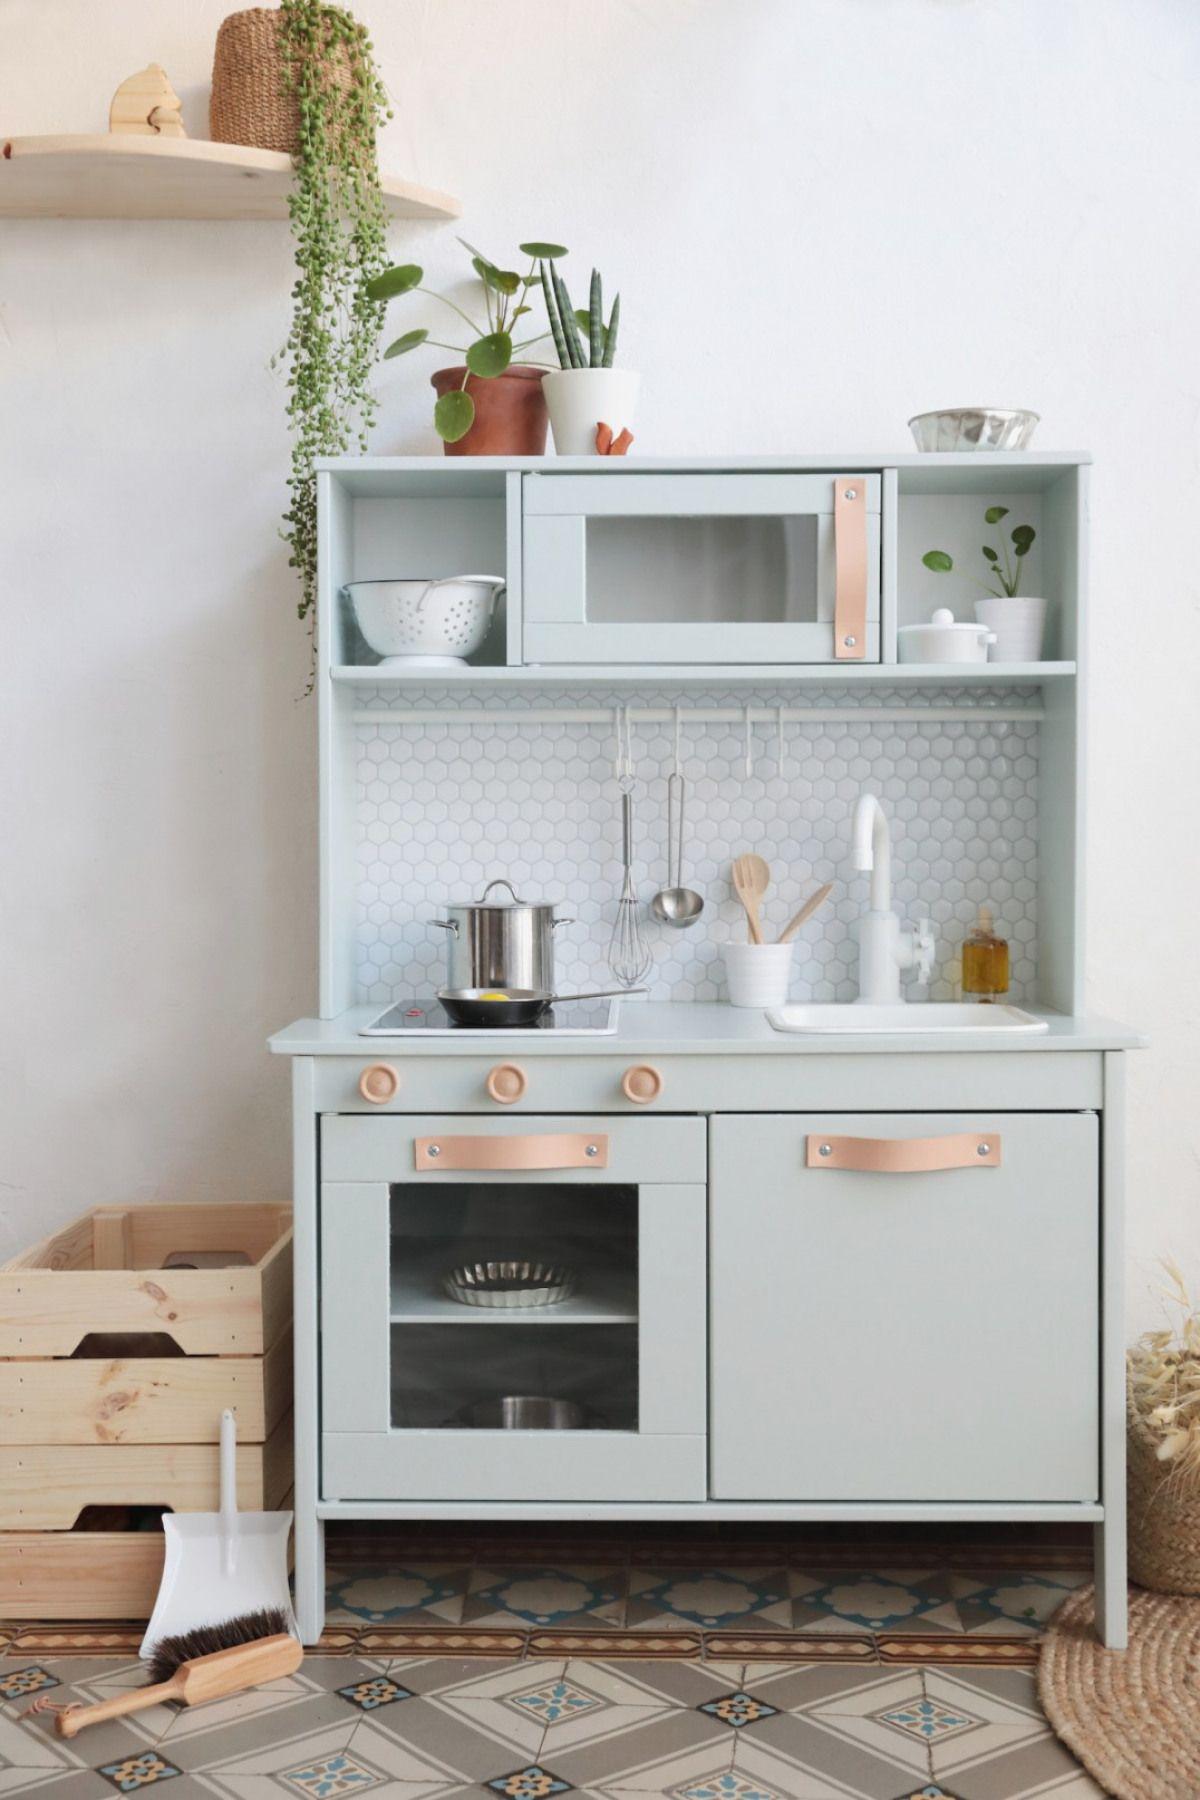 Ikea Duktig Kitchen Size